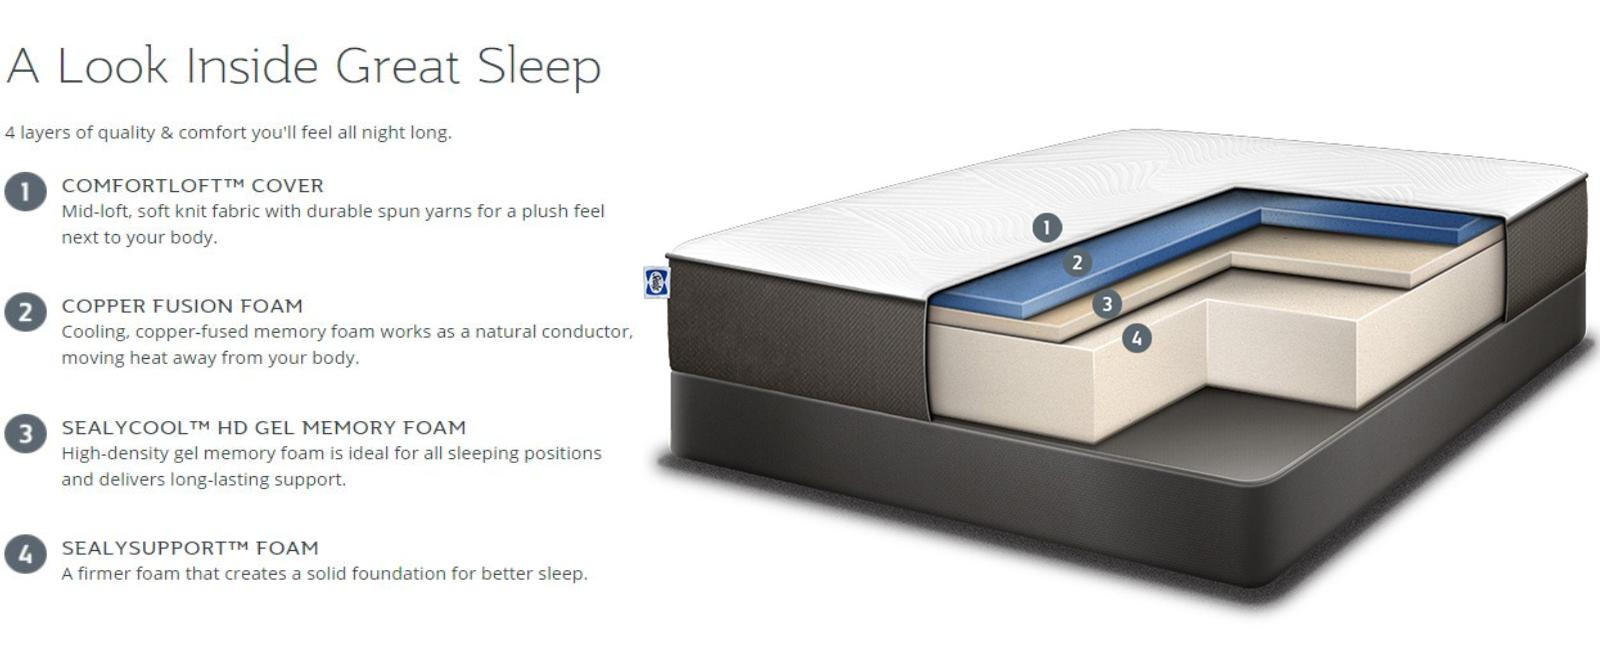 A Look Inside Great Sleep